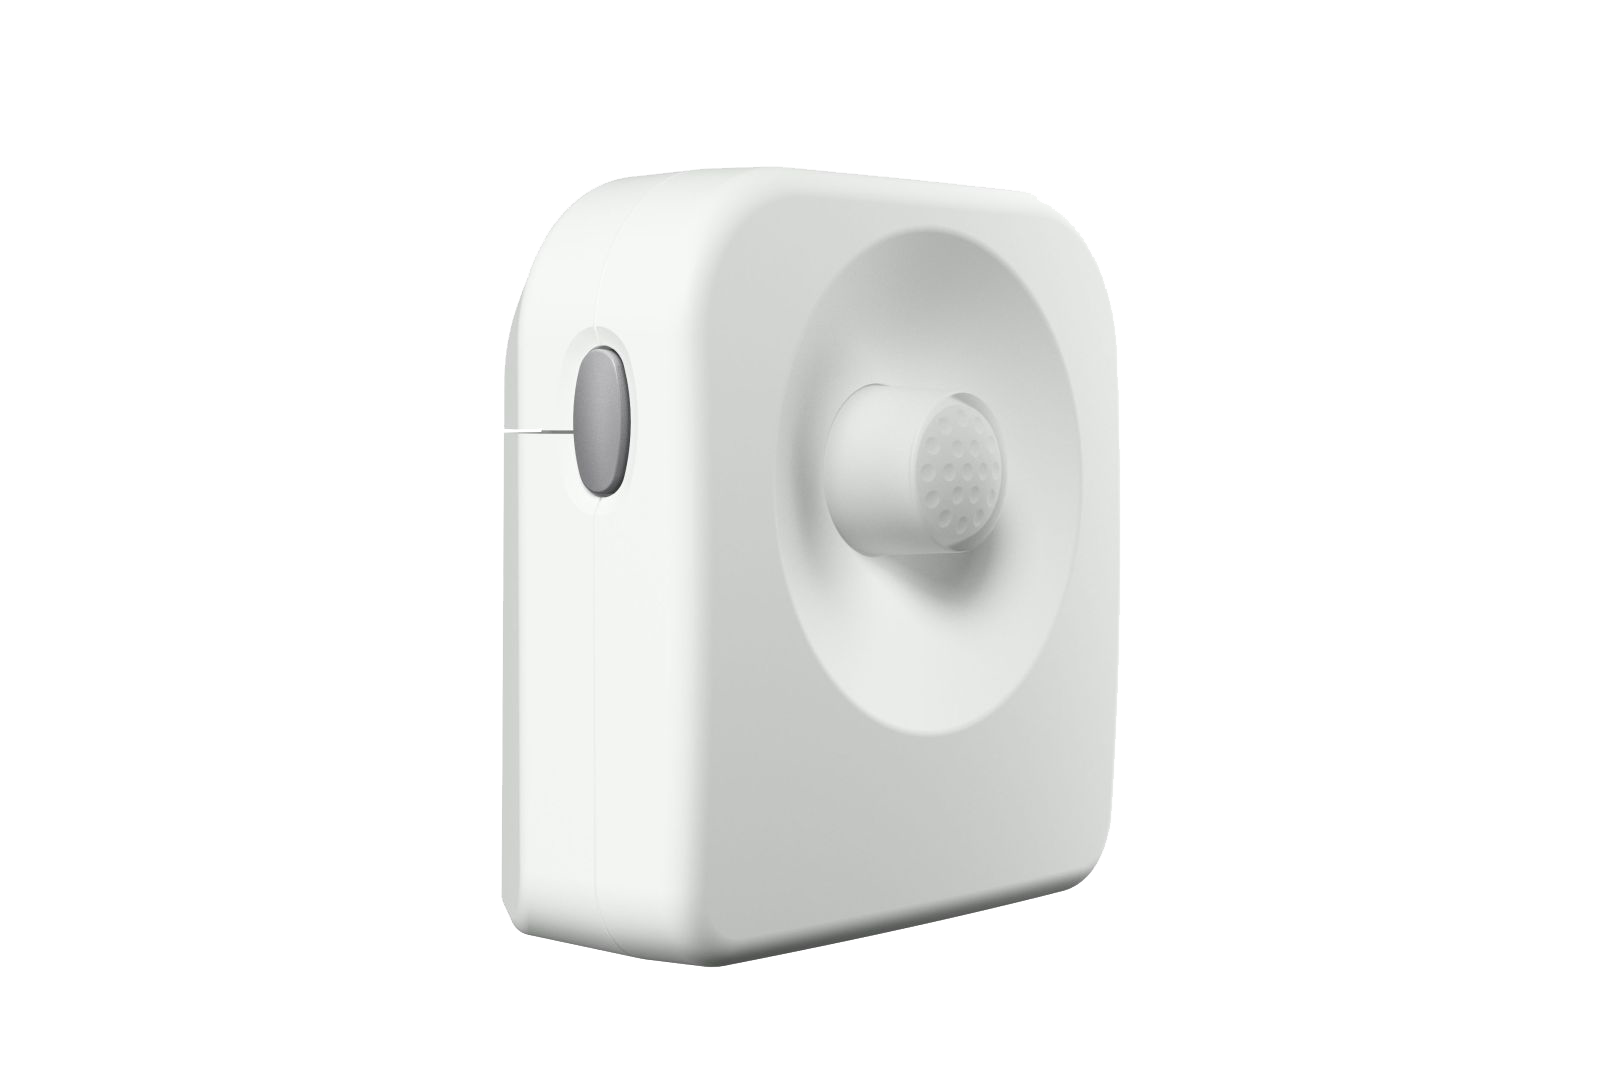 OsramLIGHTIFY Motion Bewegungs Sensor | Funk-Bewegungsmelder | ZigBee